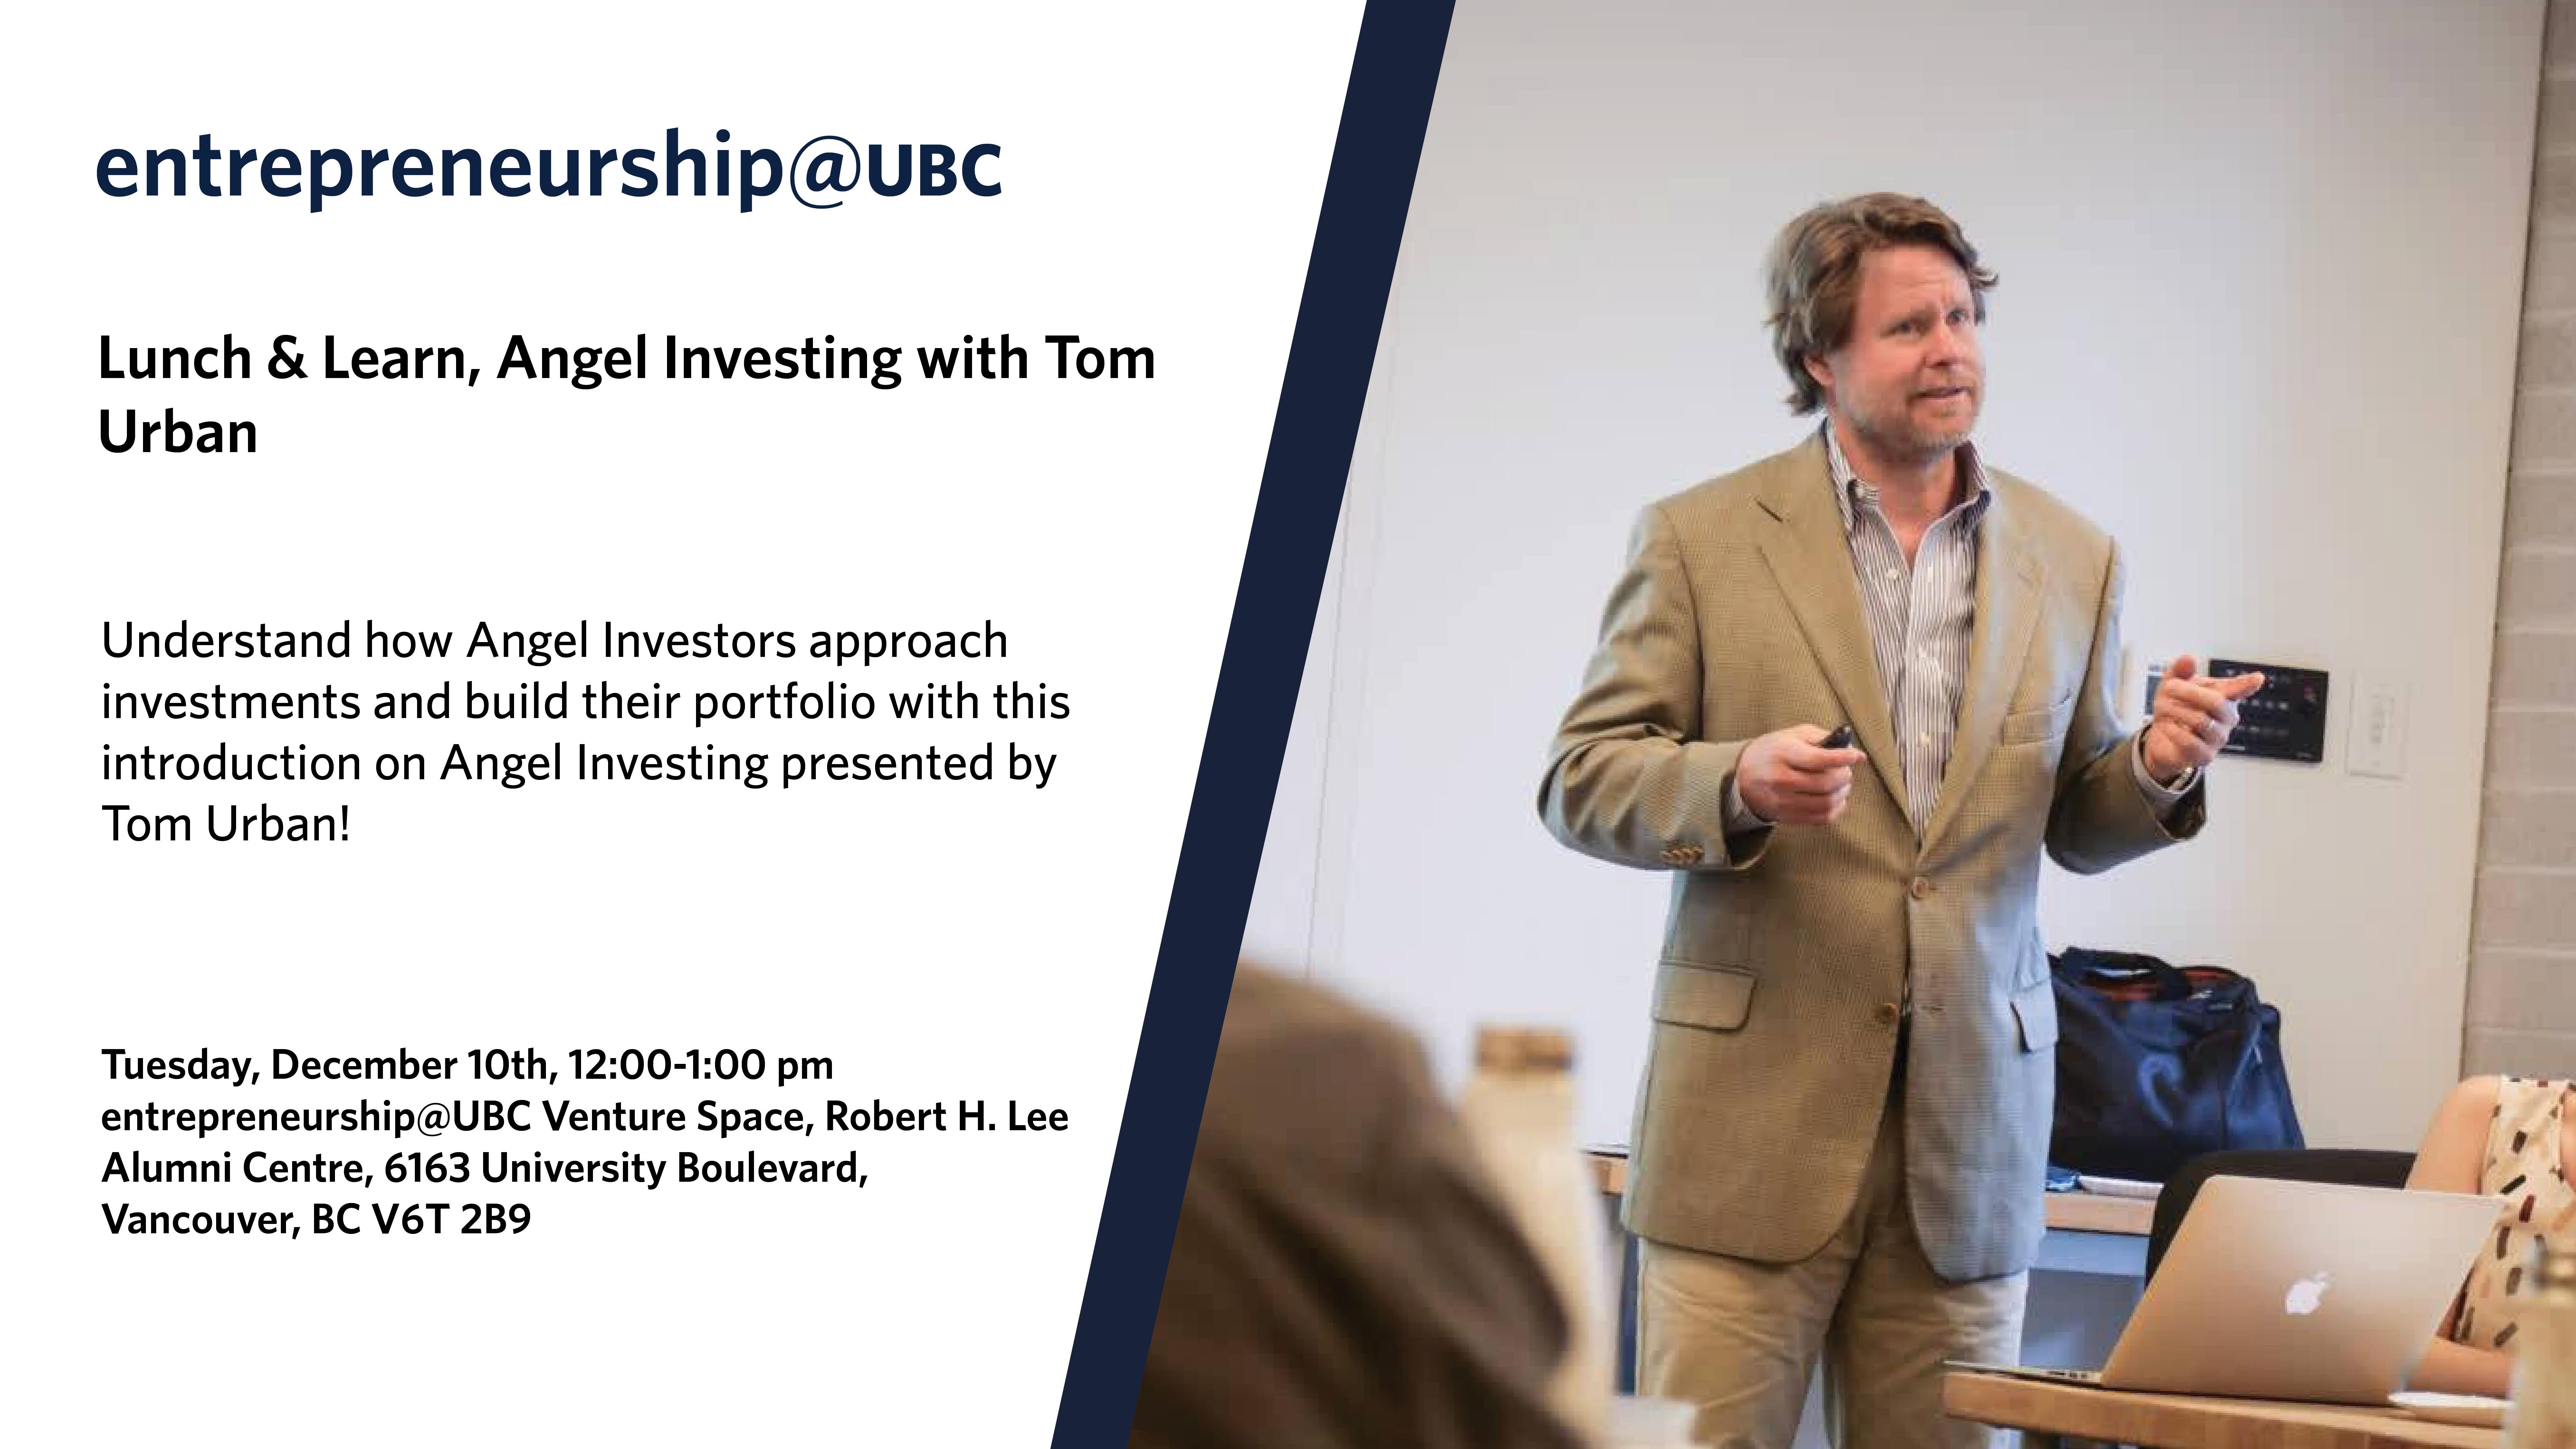 entrepreneurship@UBC Lunch & Learn, with Tom Urban